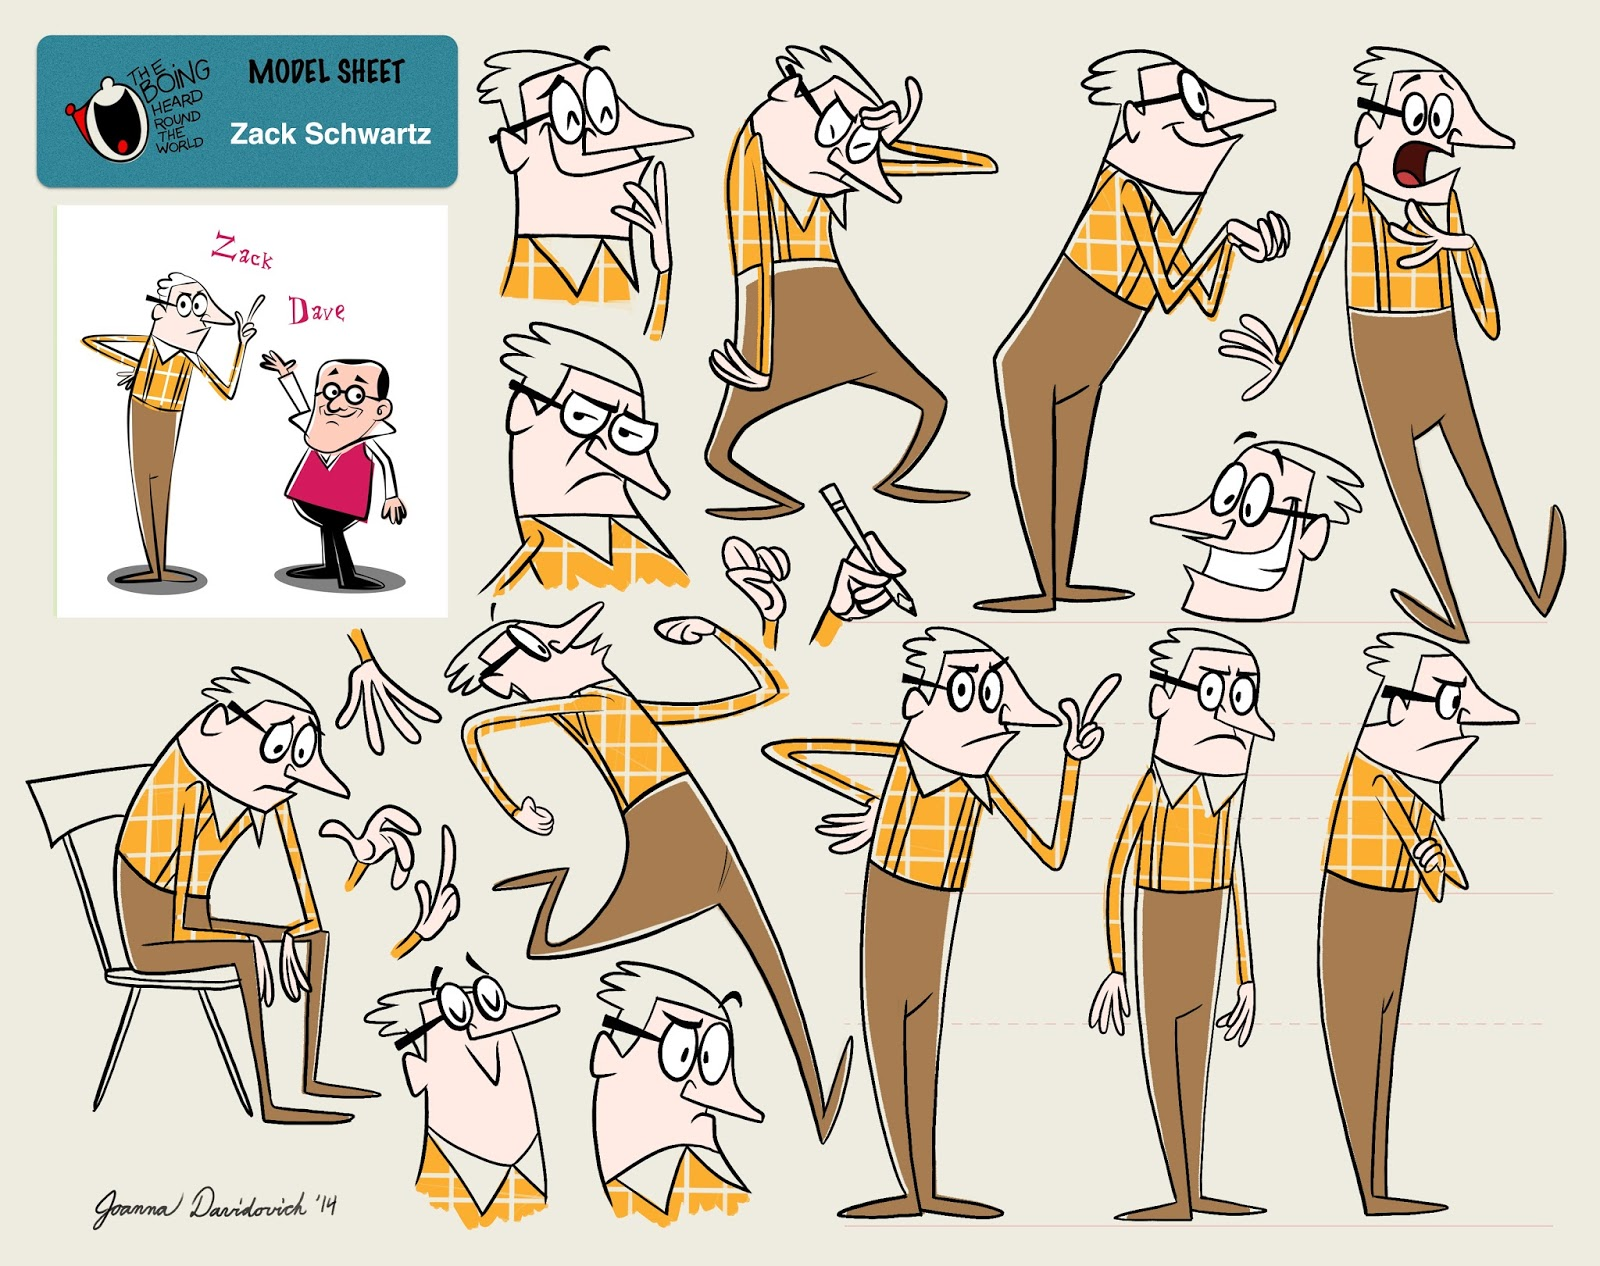 Character Design Upa : Joanna davidovich s art animation upa doc zack